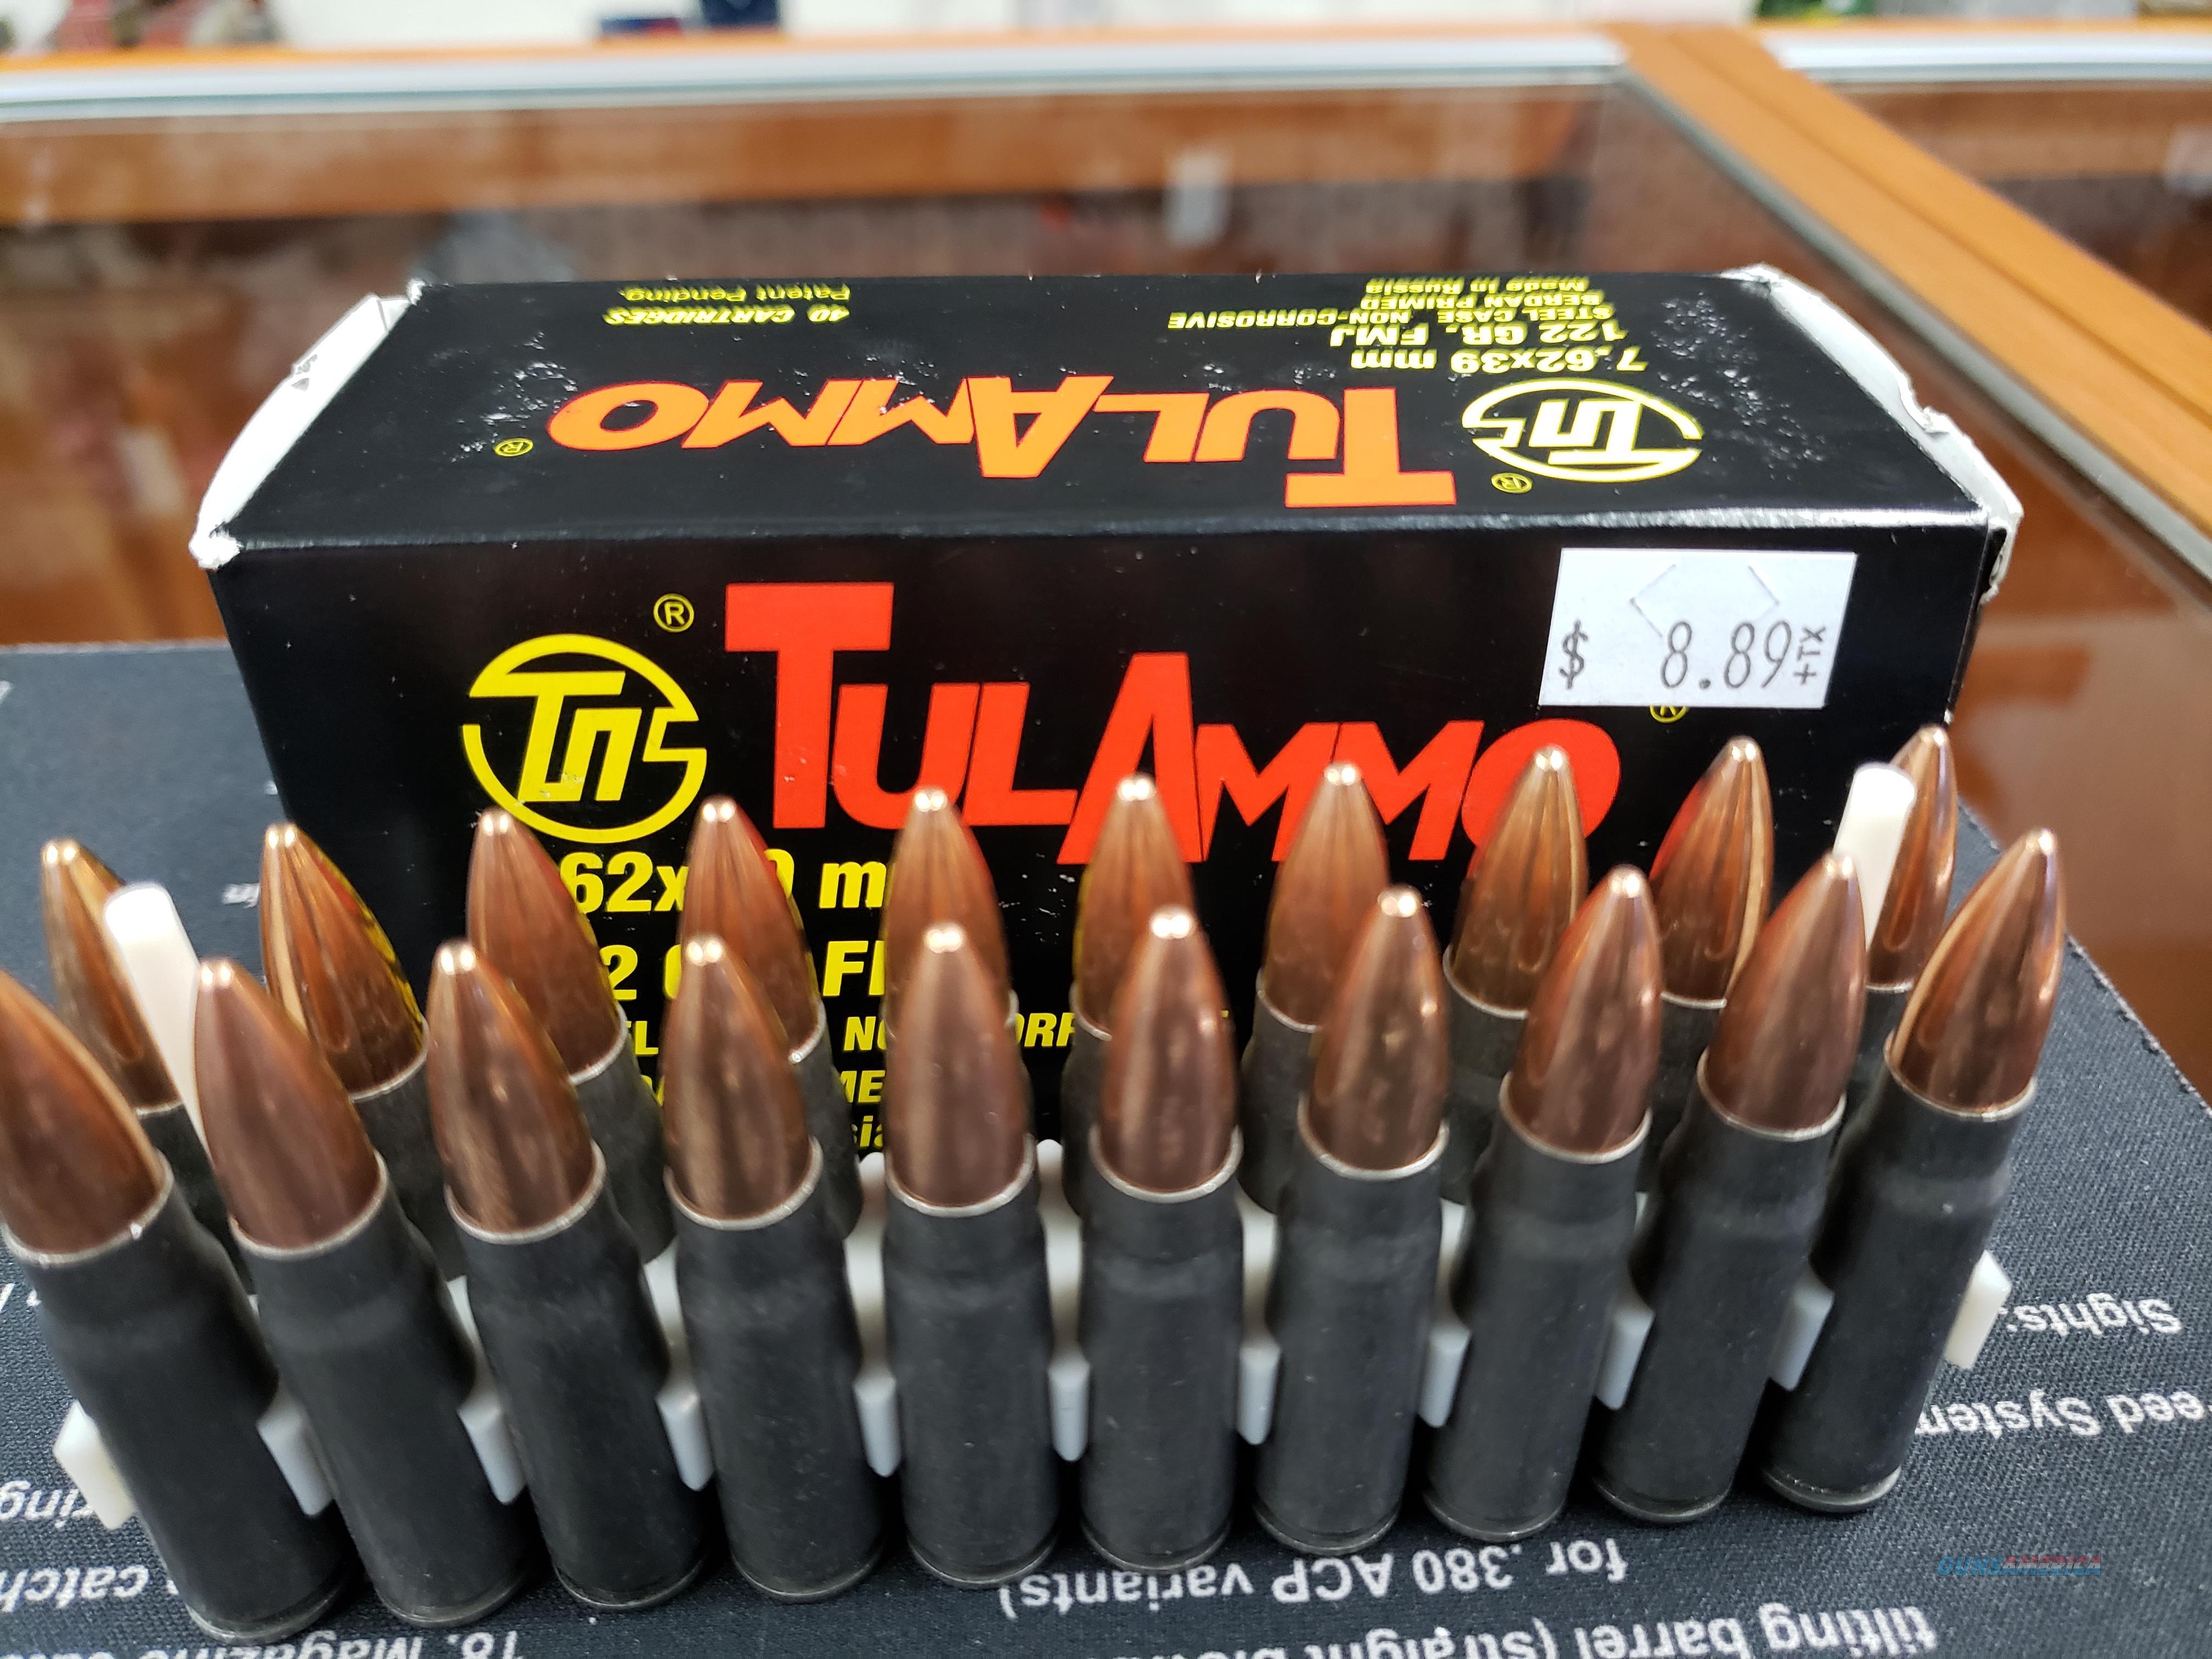 Tulammo UL076240 Centerfire Rifle 7.62X39mm 122 GR FMJ 40 Bx  Non-Guns > Ammunition